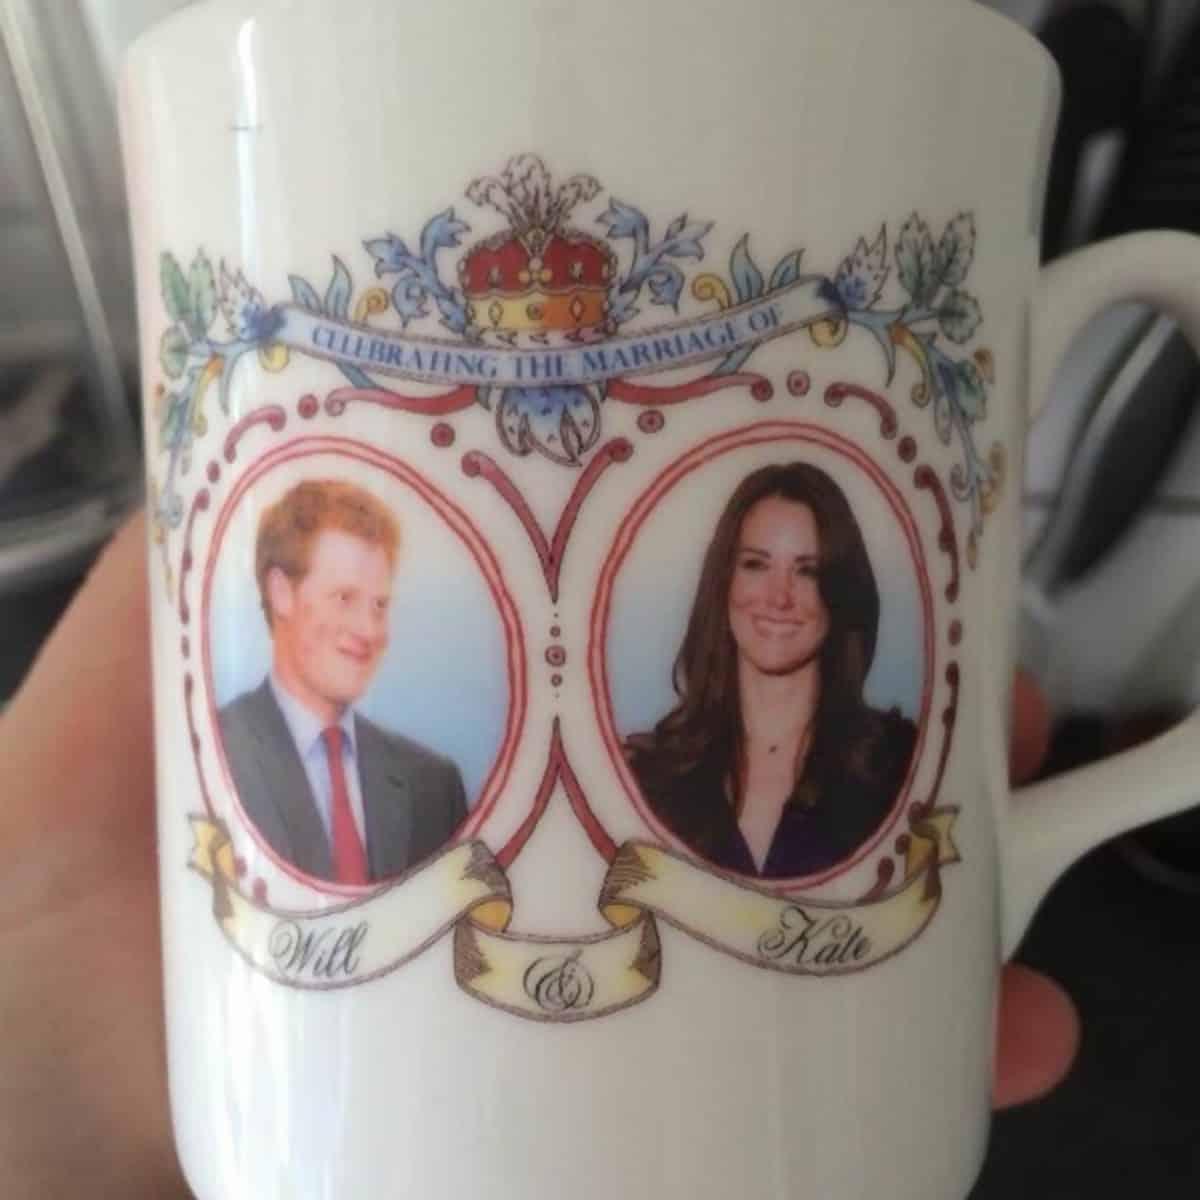 Macintosh HD:Users:brittanyloeffler:Downloads:Upwork:Trying:royal-wedding-89733.jpg